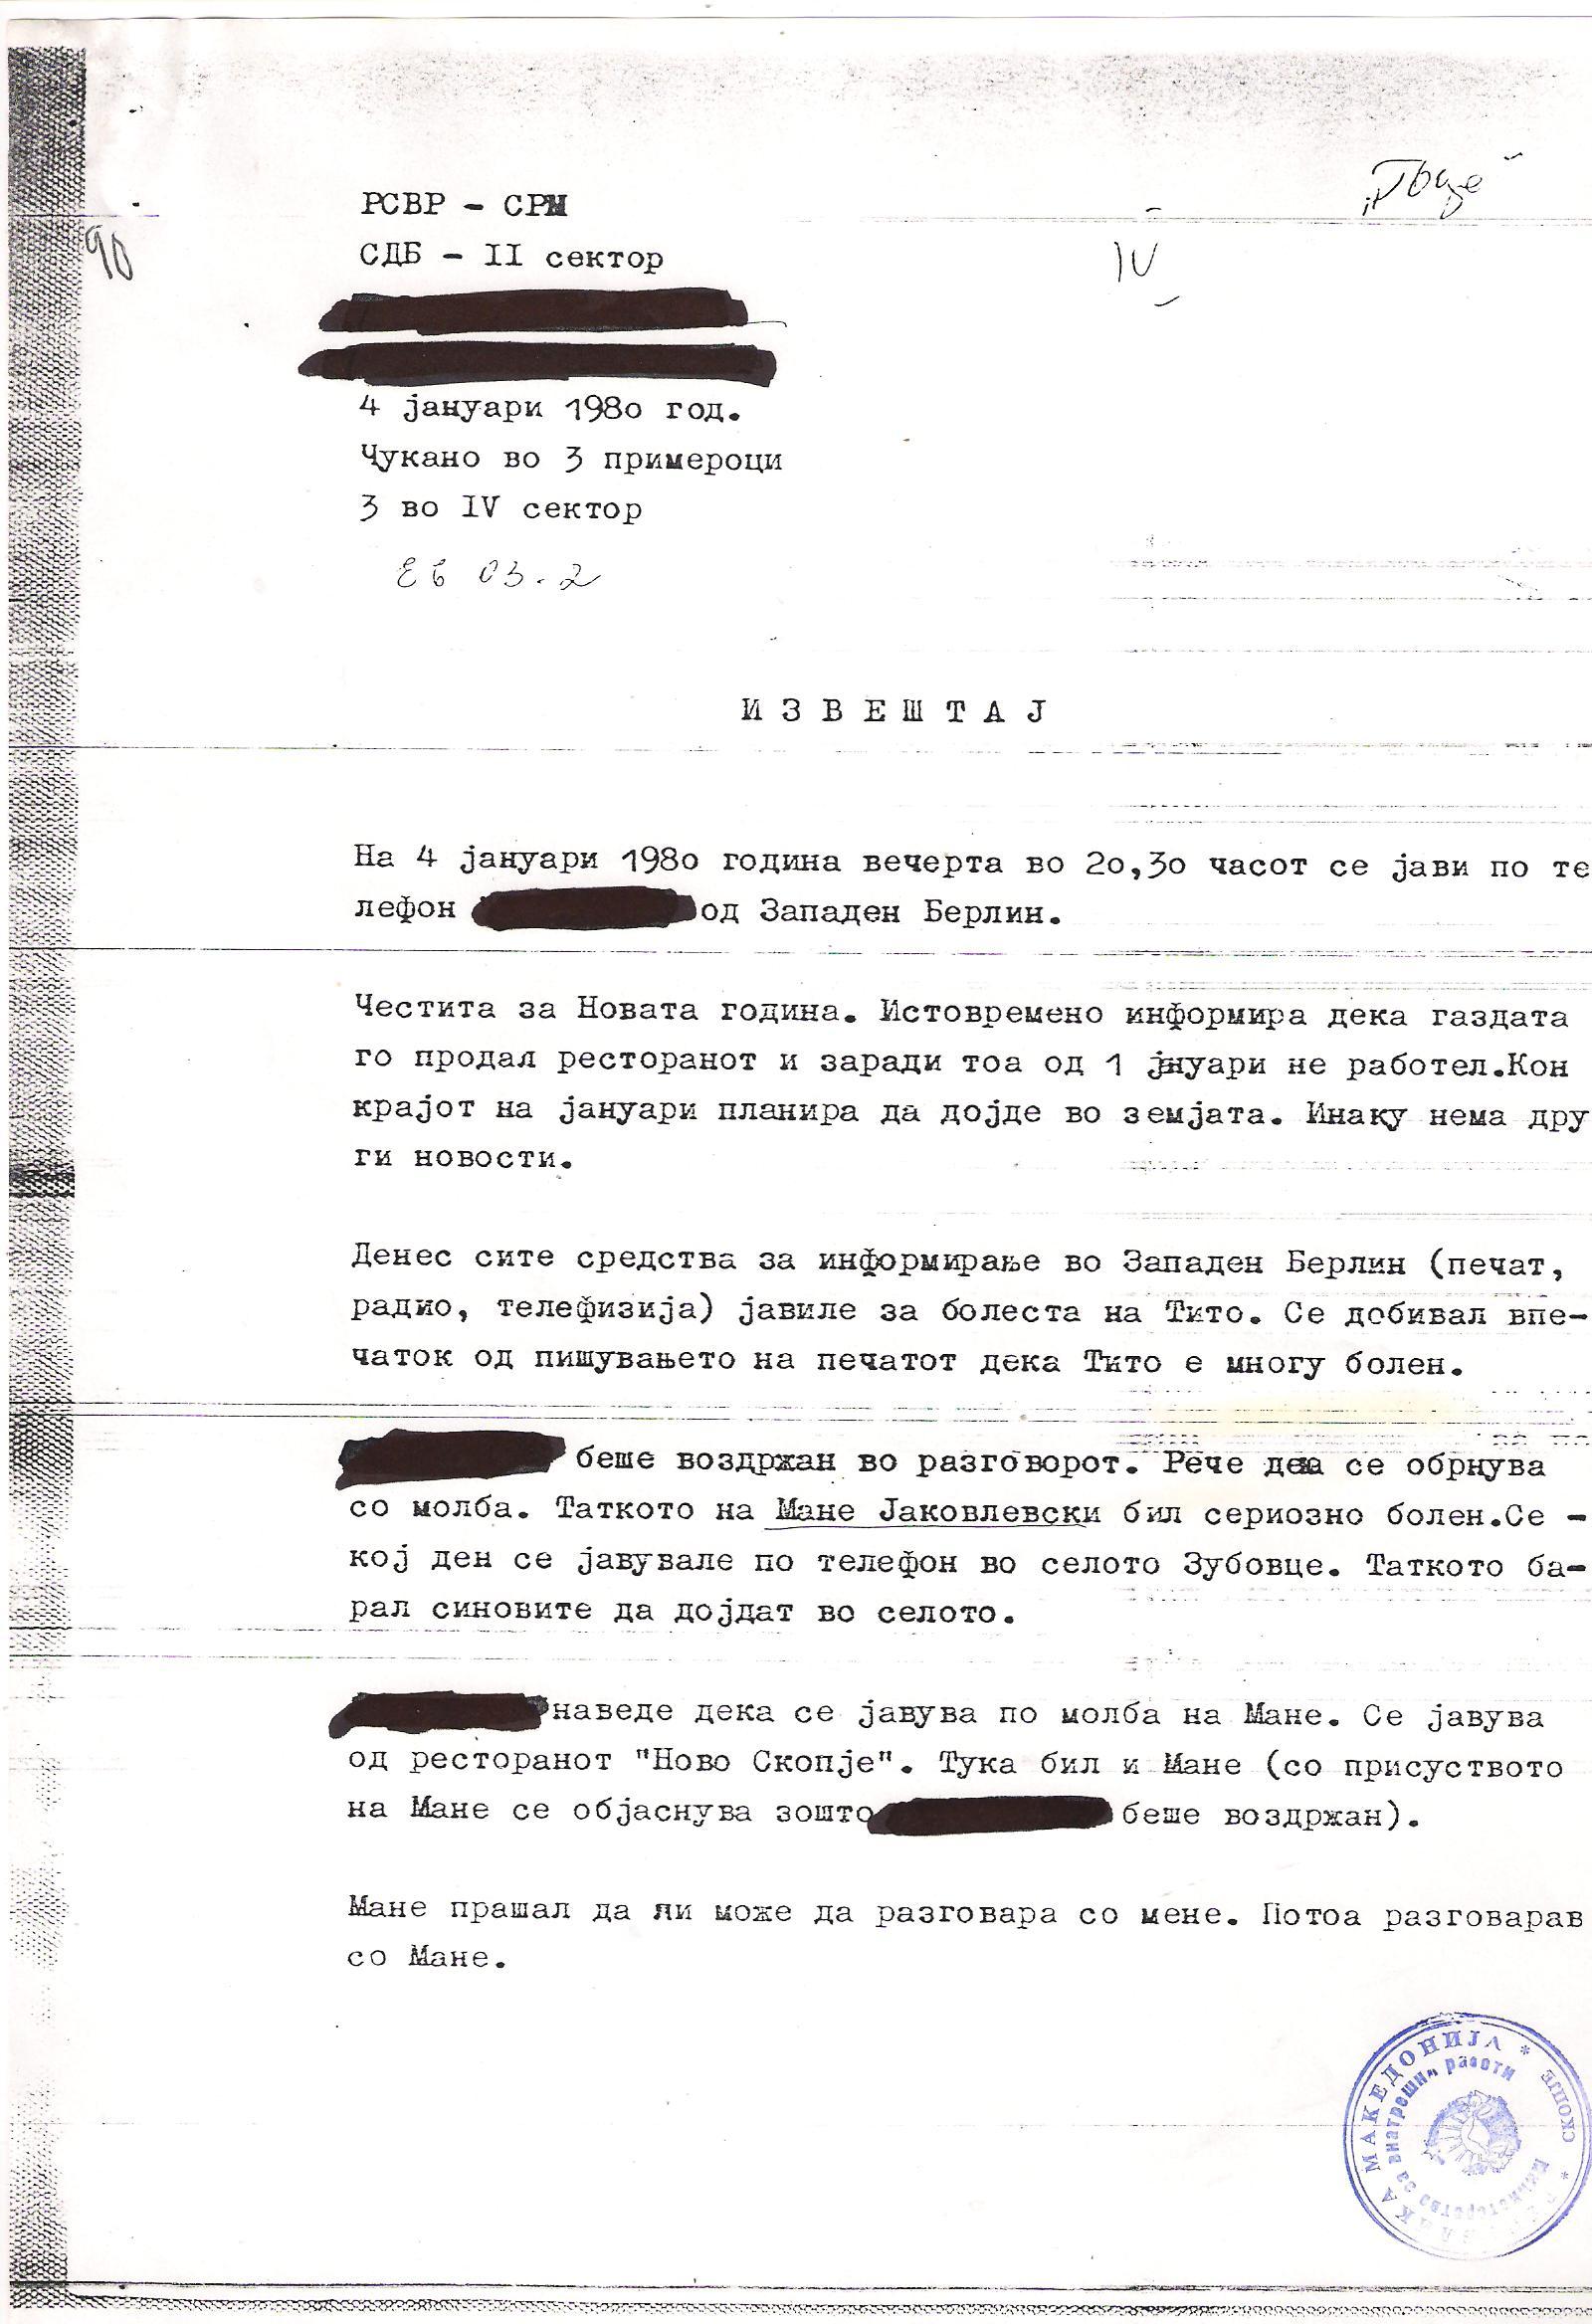 4.јануари 1980   -мане молба за патуванје